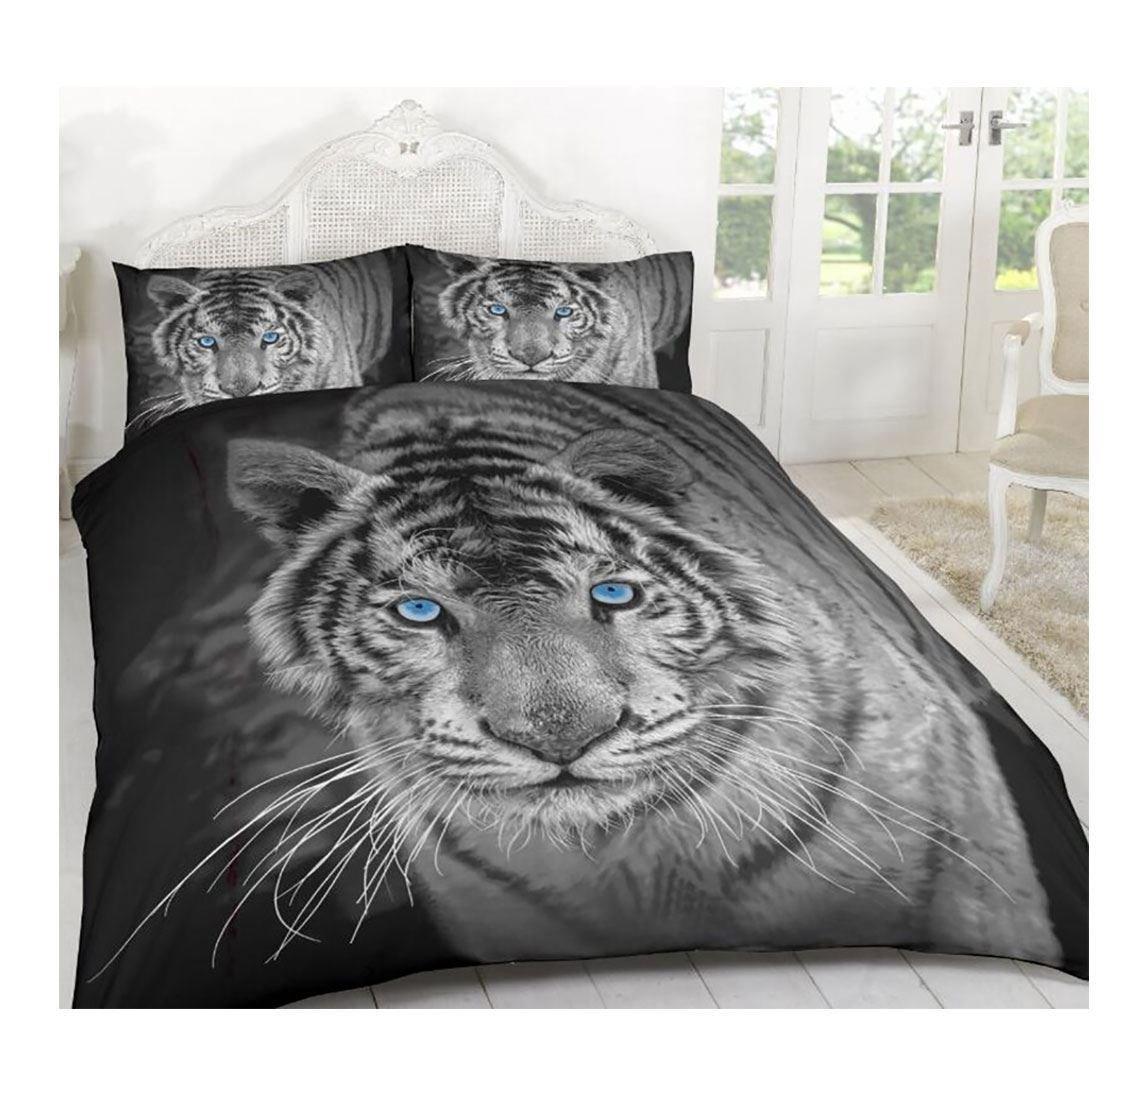 Rimi Hanger Black White Tiger 3D Animal Printed Duvet Bedding Covers Set With Pillowcases Double